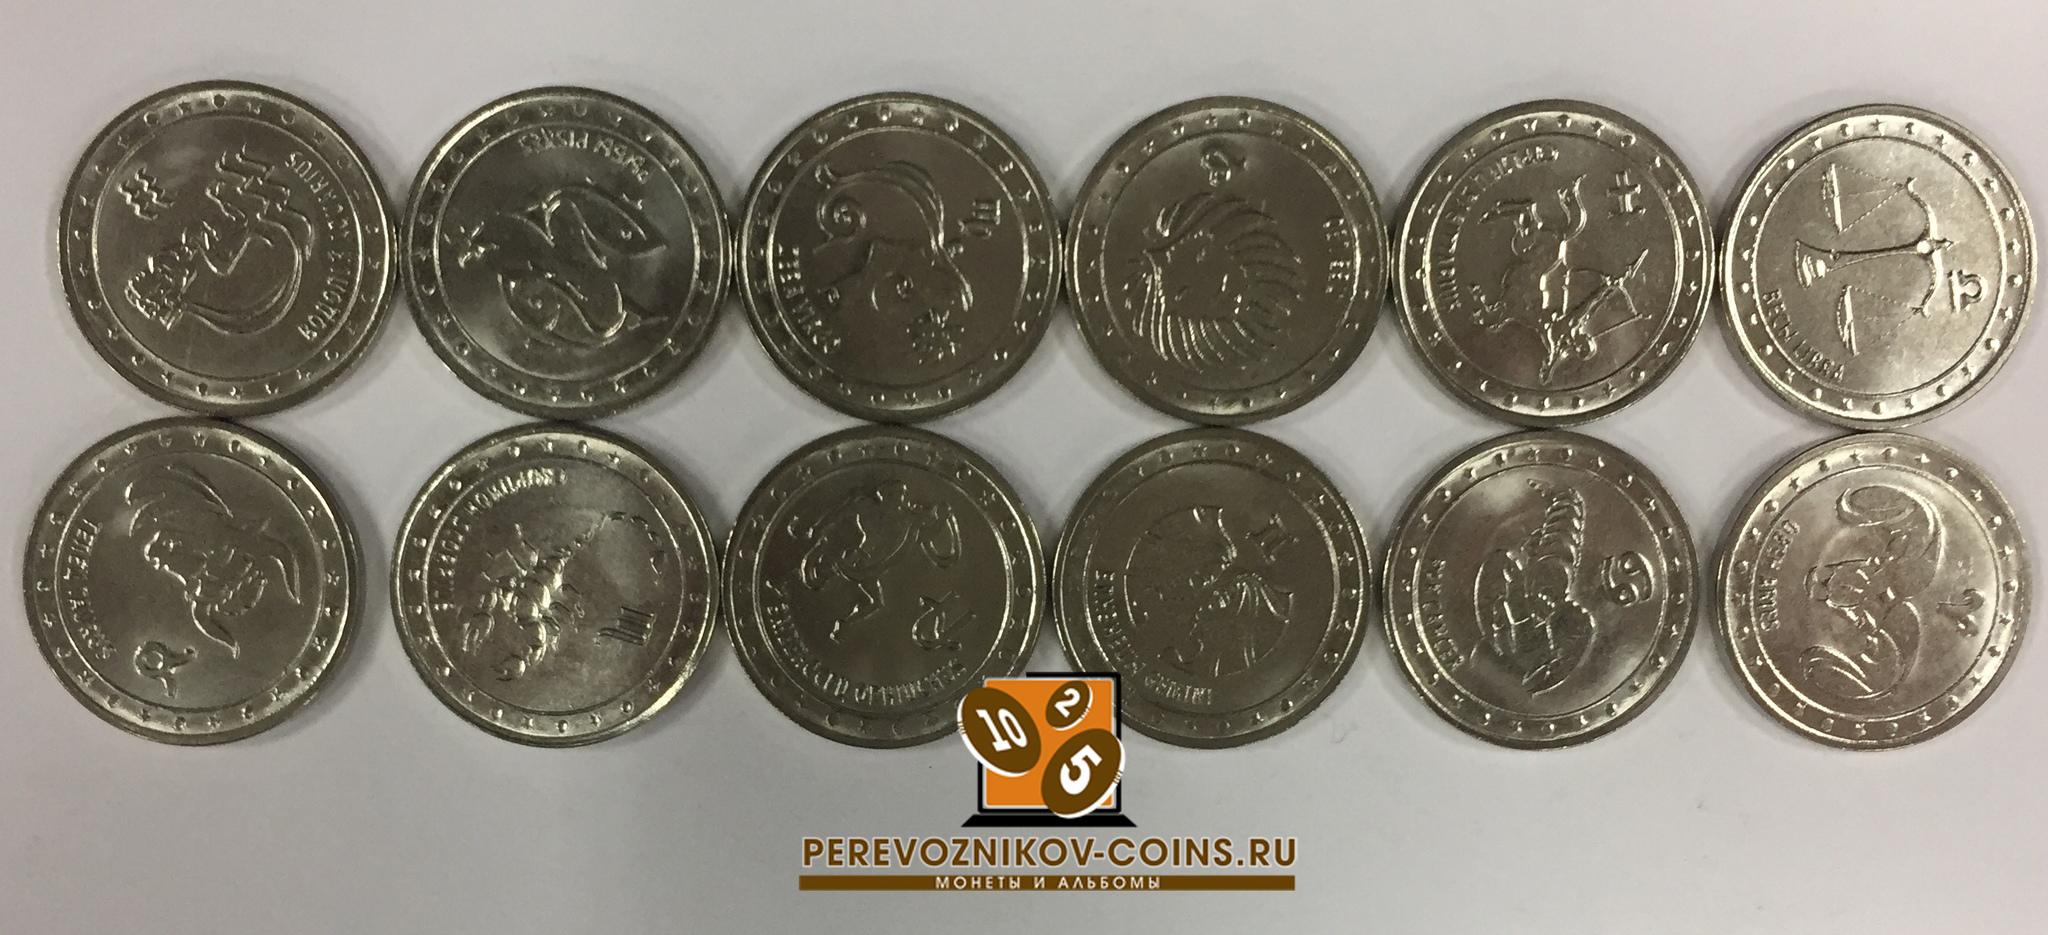 "Набор из 13 монет ""Знаки зодиака"". Приднестровье. 2016 год"